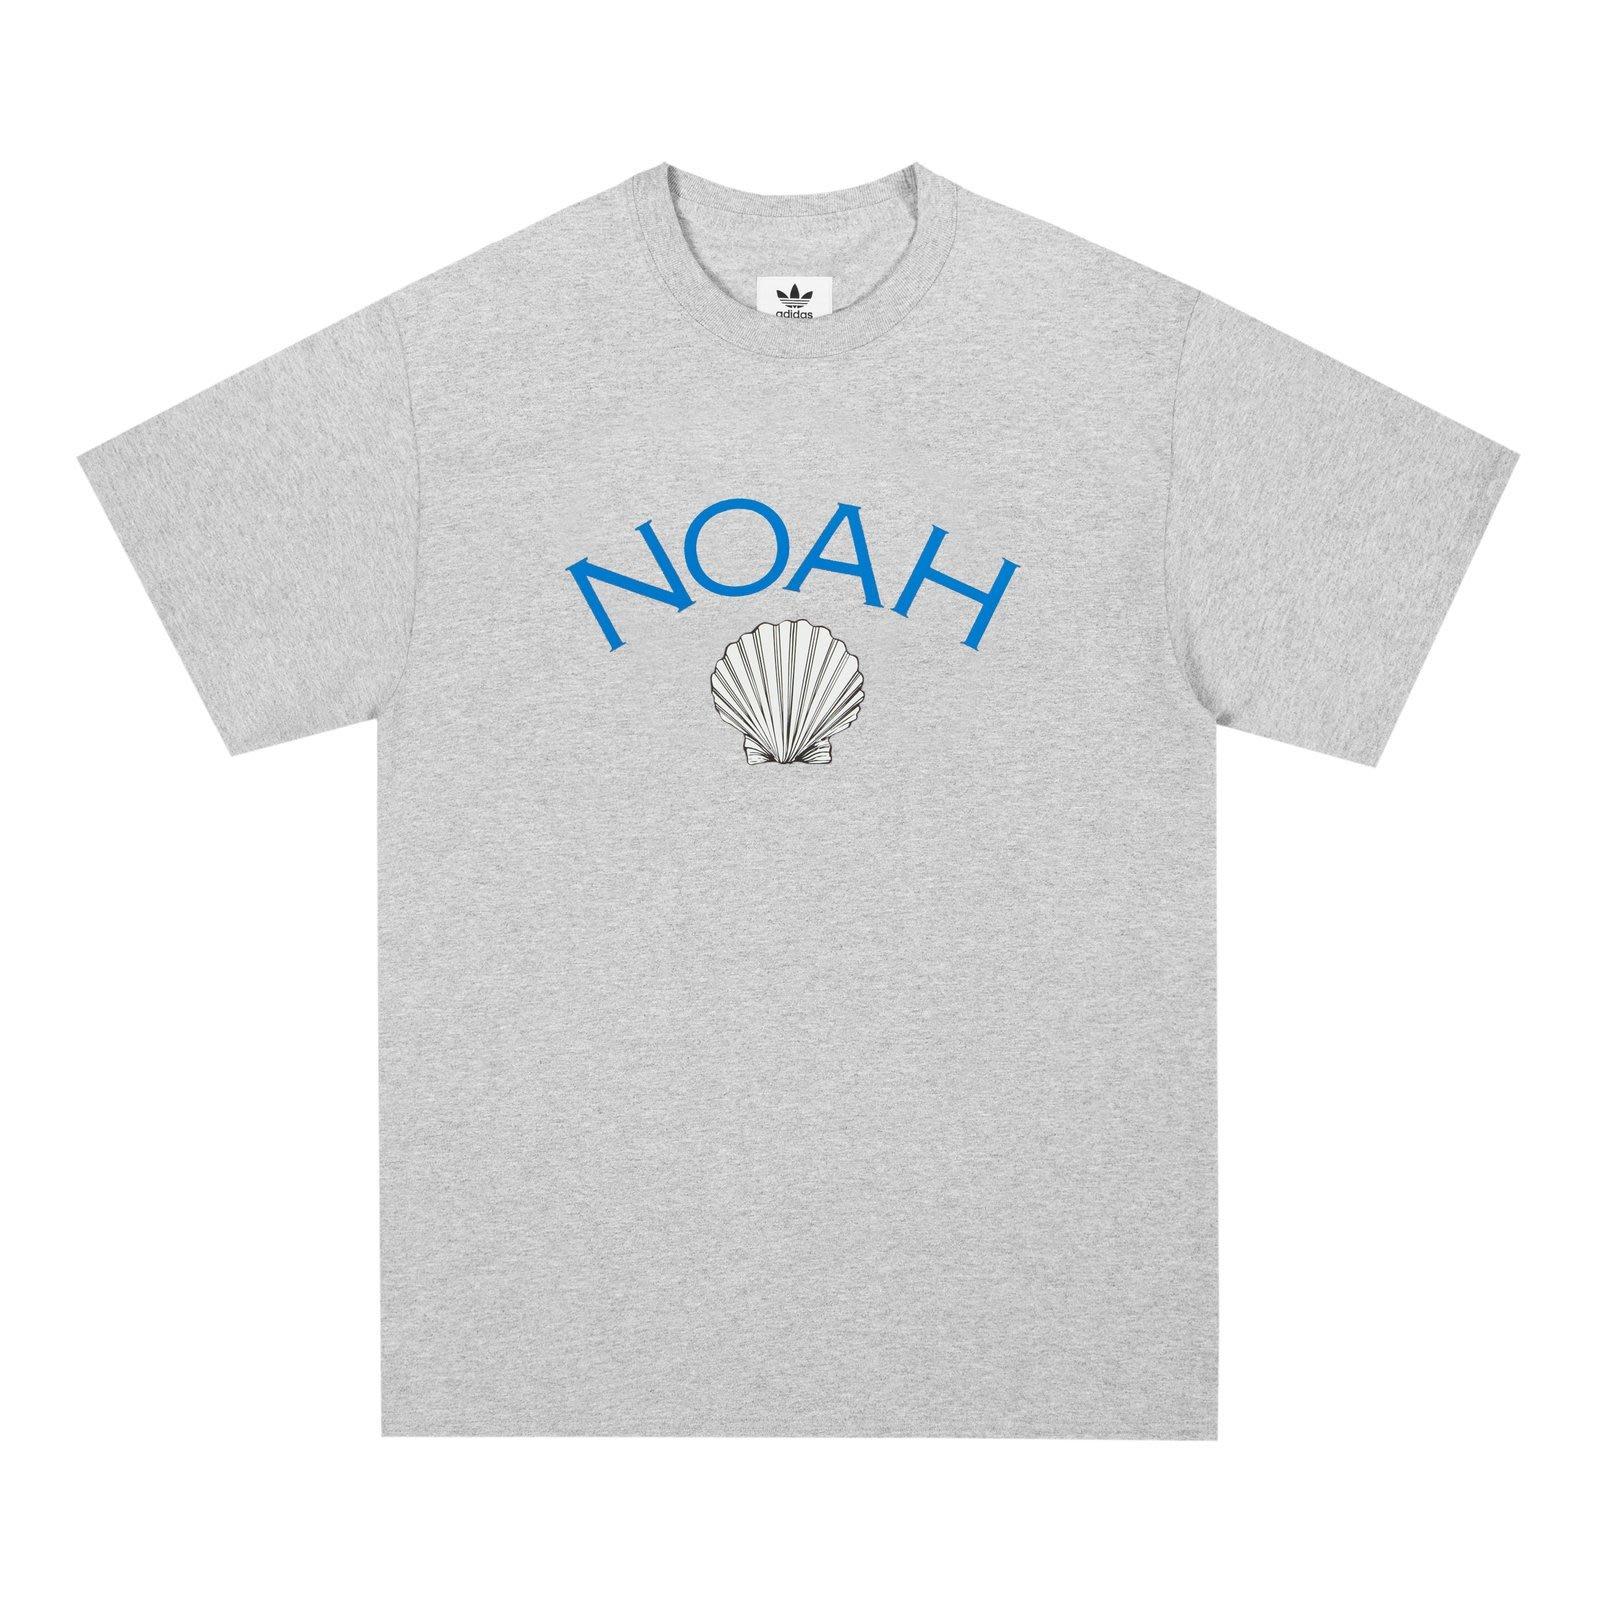 【日貨代購CITY】2020AW NOAH Adidas Shell Logo Pocket 灰 貝殼 口袋 短T 現貨